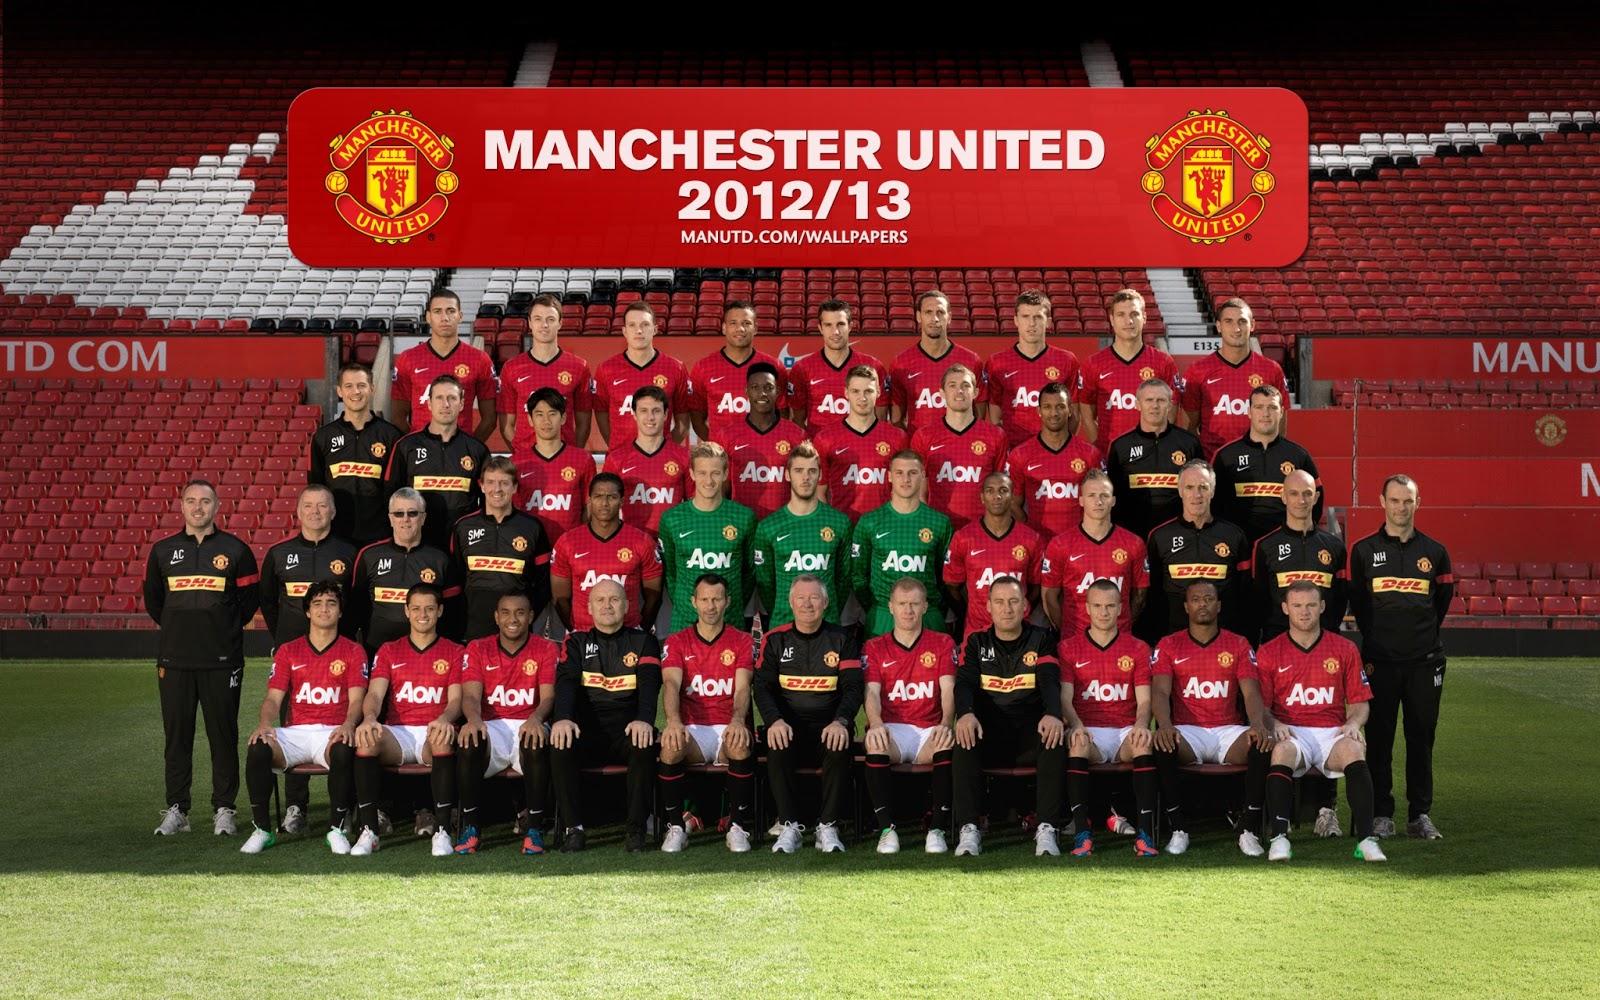 http://1.bp.blogspot.com/-BbrOr38hbKY/UQPpqGv6N-I/AAAAAAAAG4E/qkmVFXiu8jk/s1600/Manchester+United+Wallpapers+hd+2013_.jpg